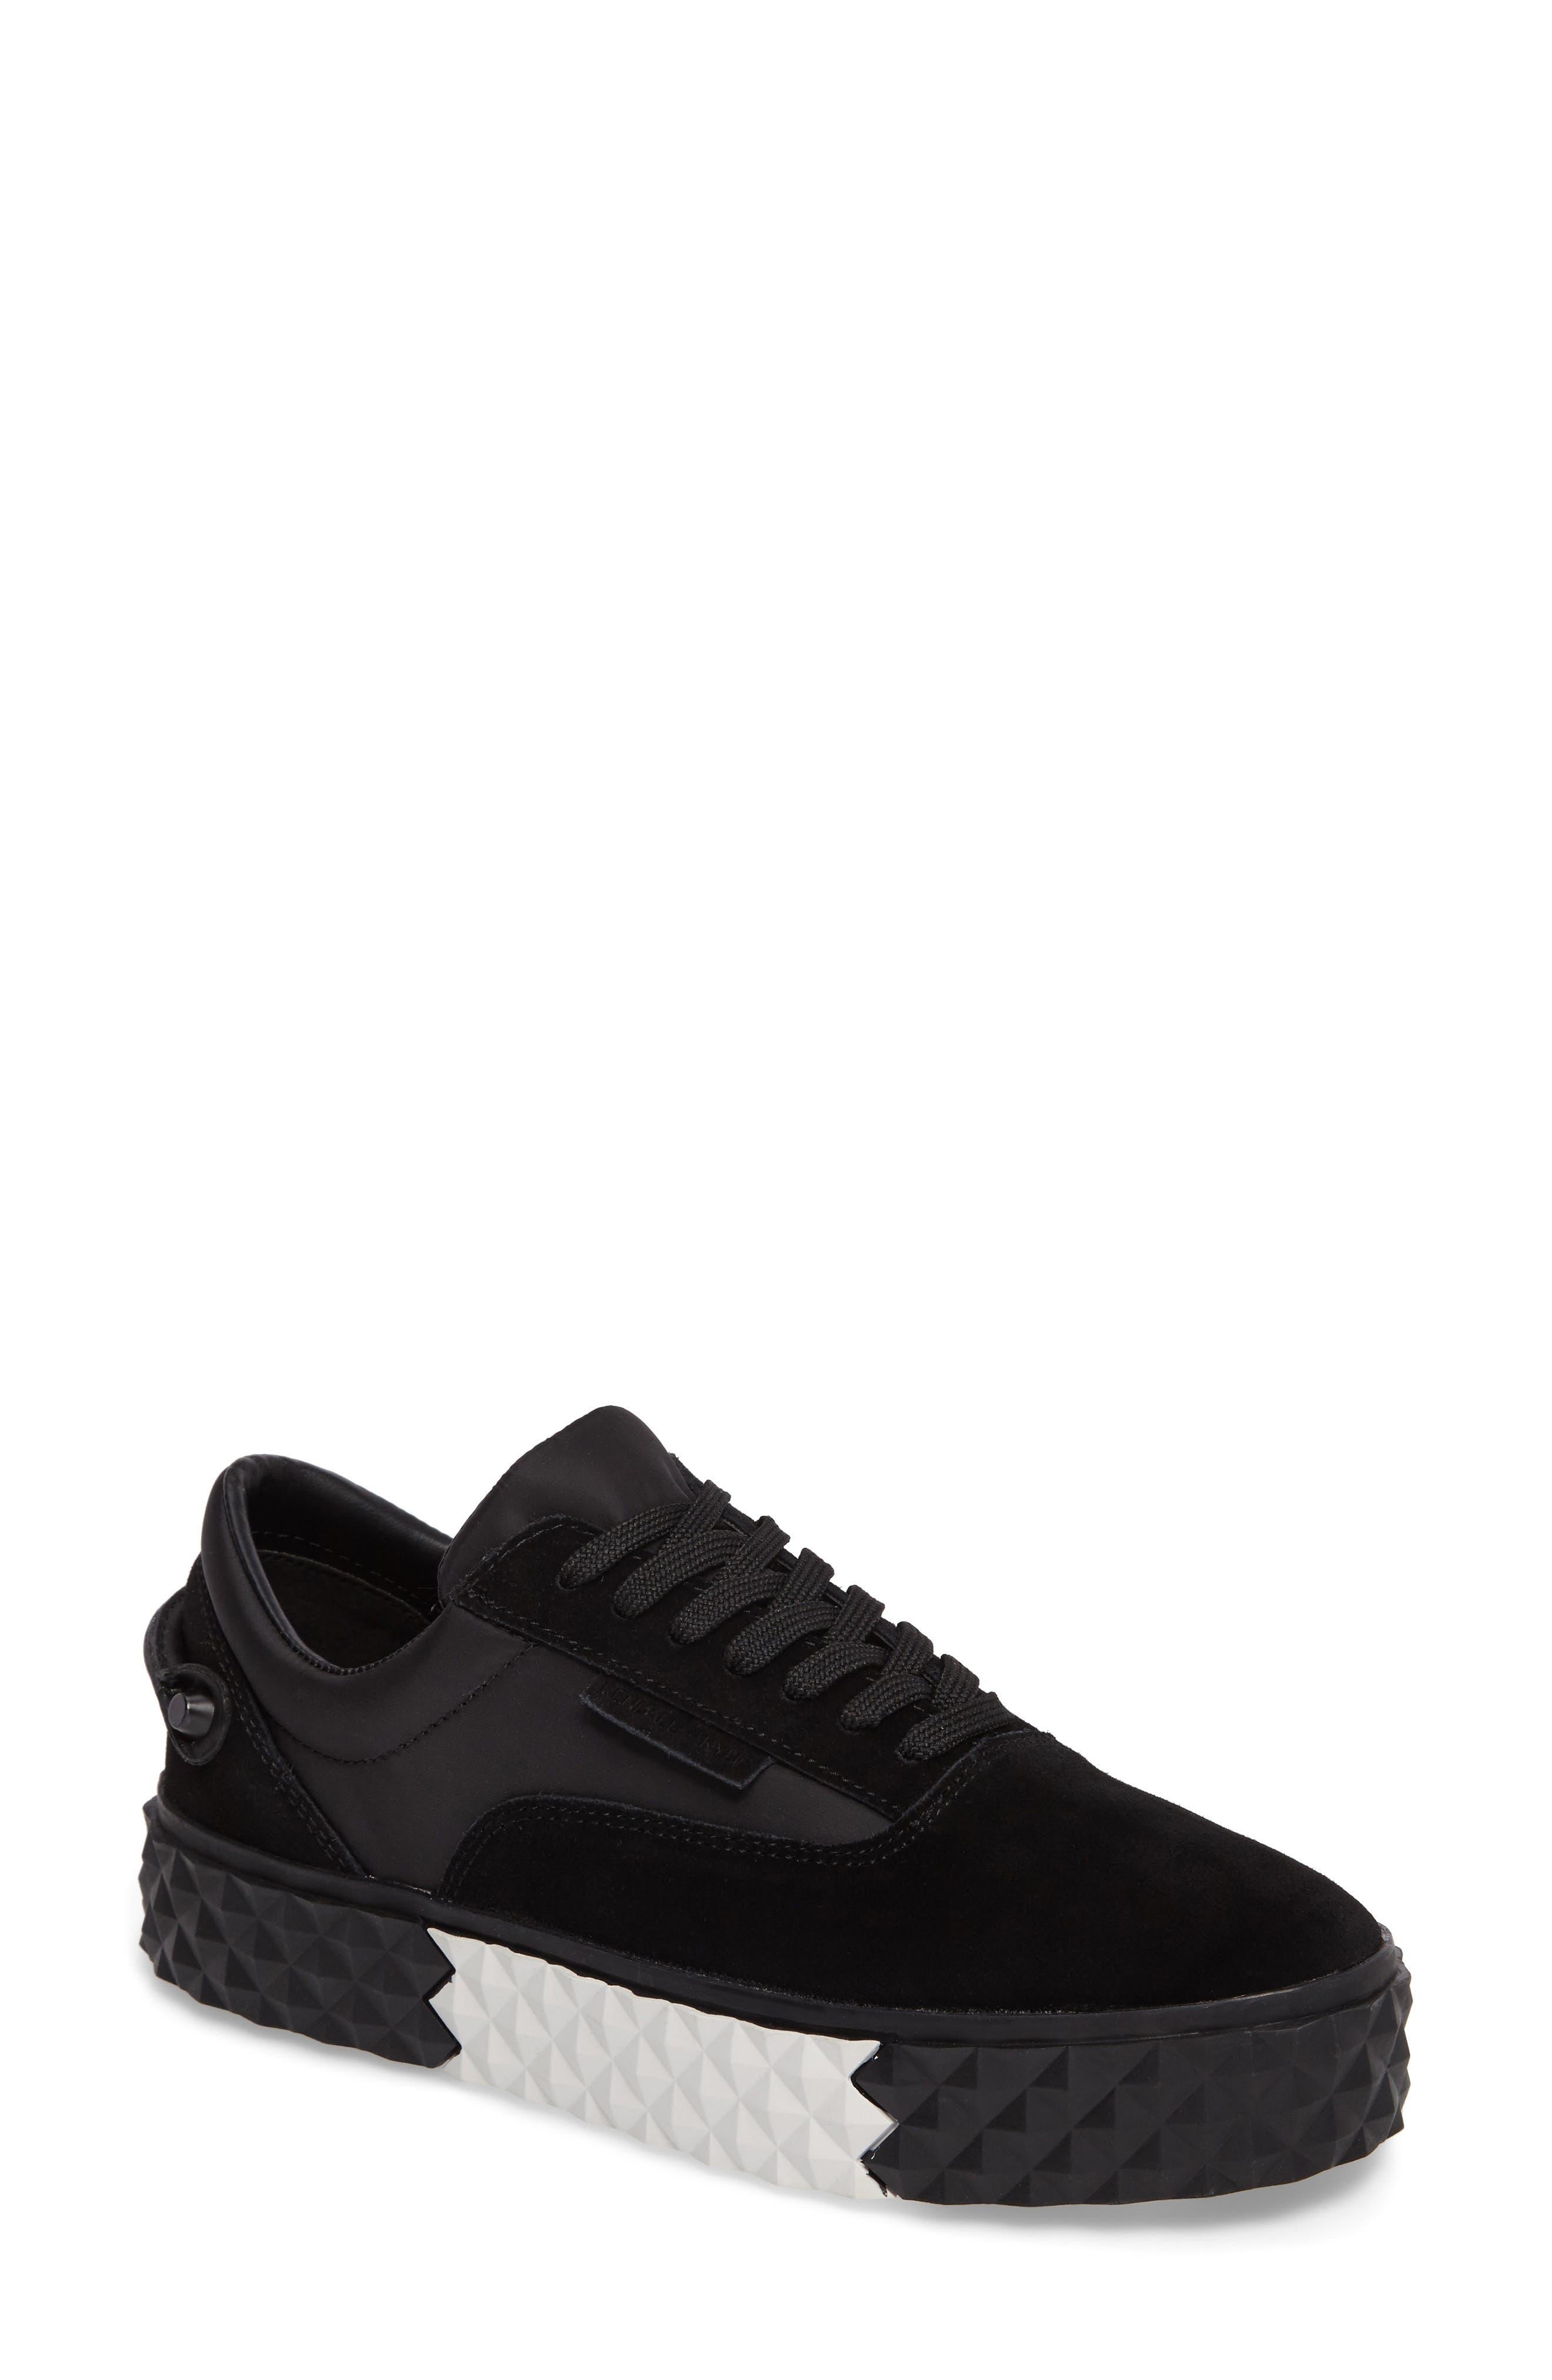 Reign Platform Sneaker,                         Main,                         color, 005